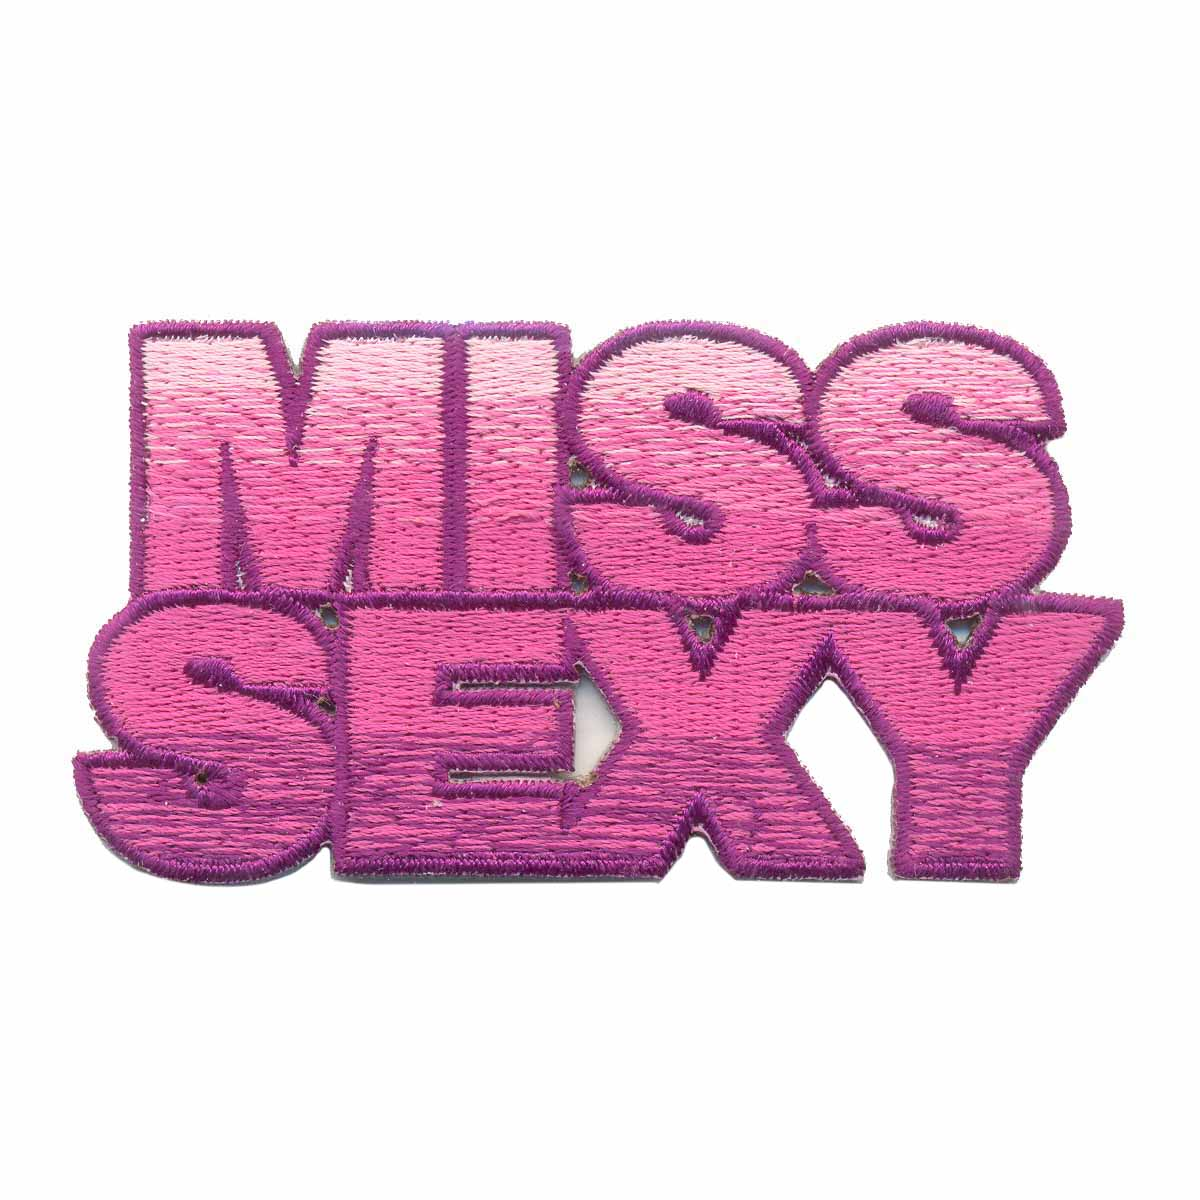 "Термоаппликация AD1172 ""Мисс Секси"", Hobby&Pro"